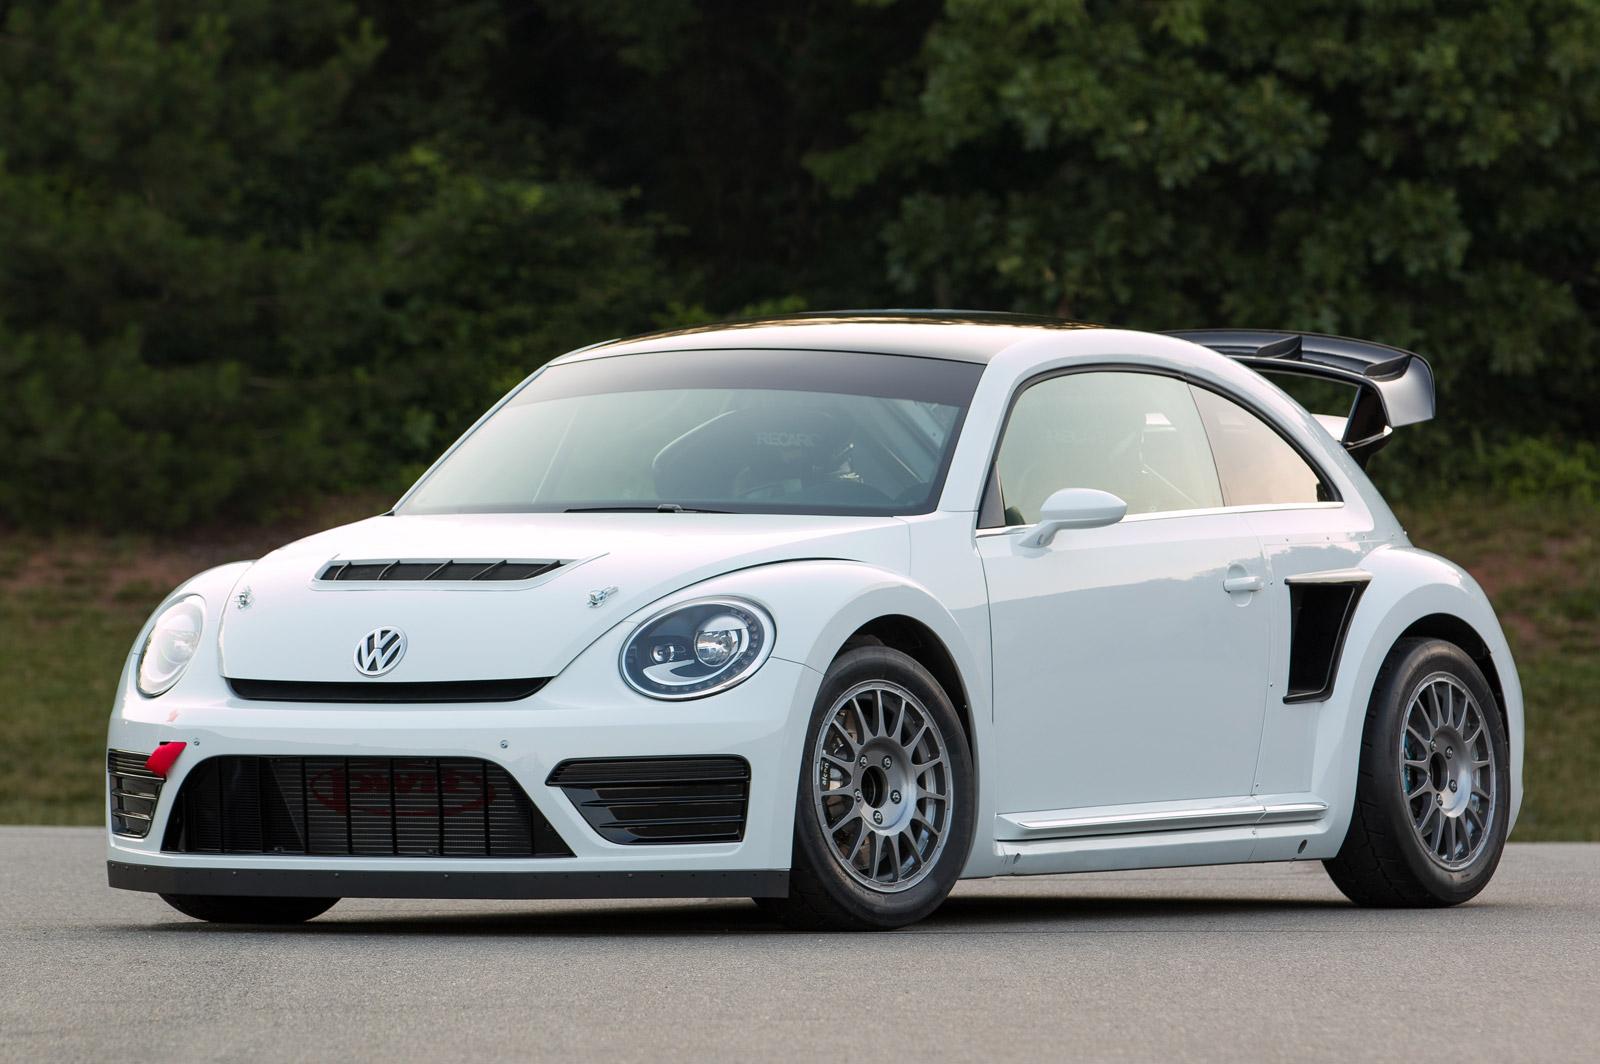 2014 volkswagen beetle global rallycross championship car revealed. Black Bedroom Furniture Sets. Home Design Ideas